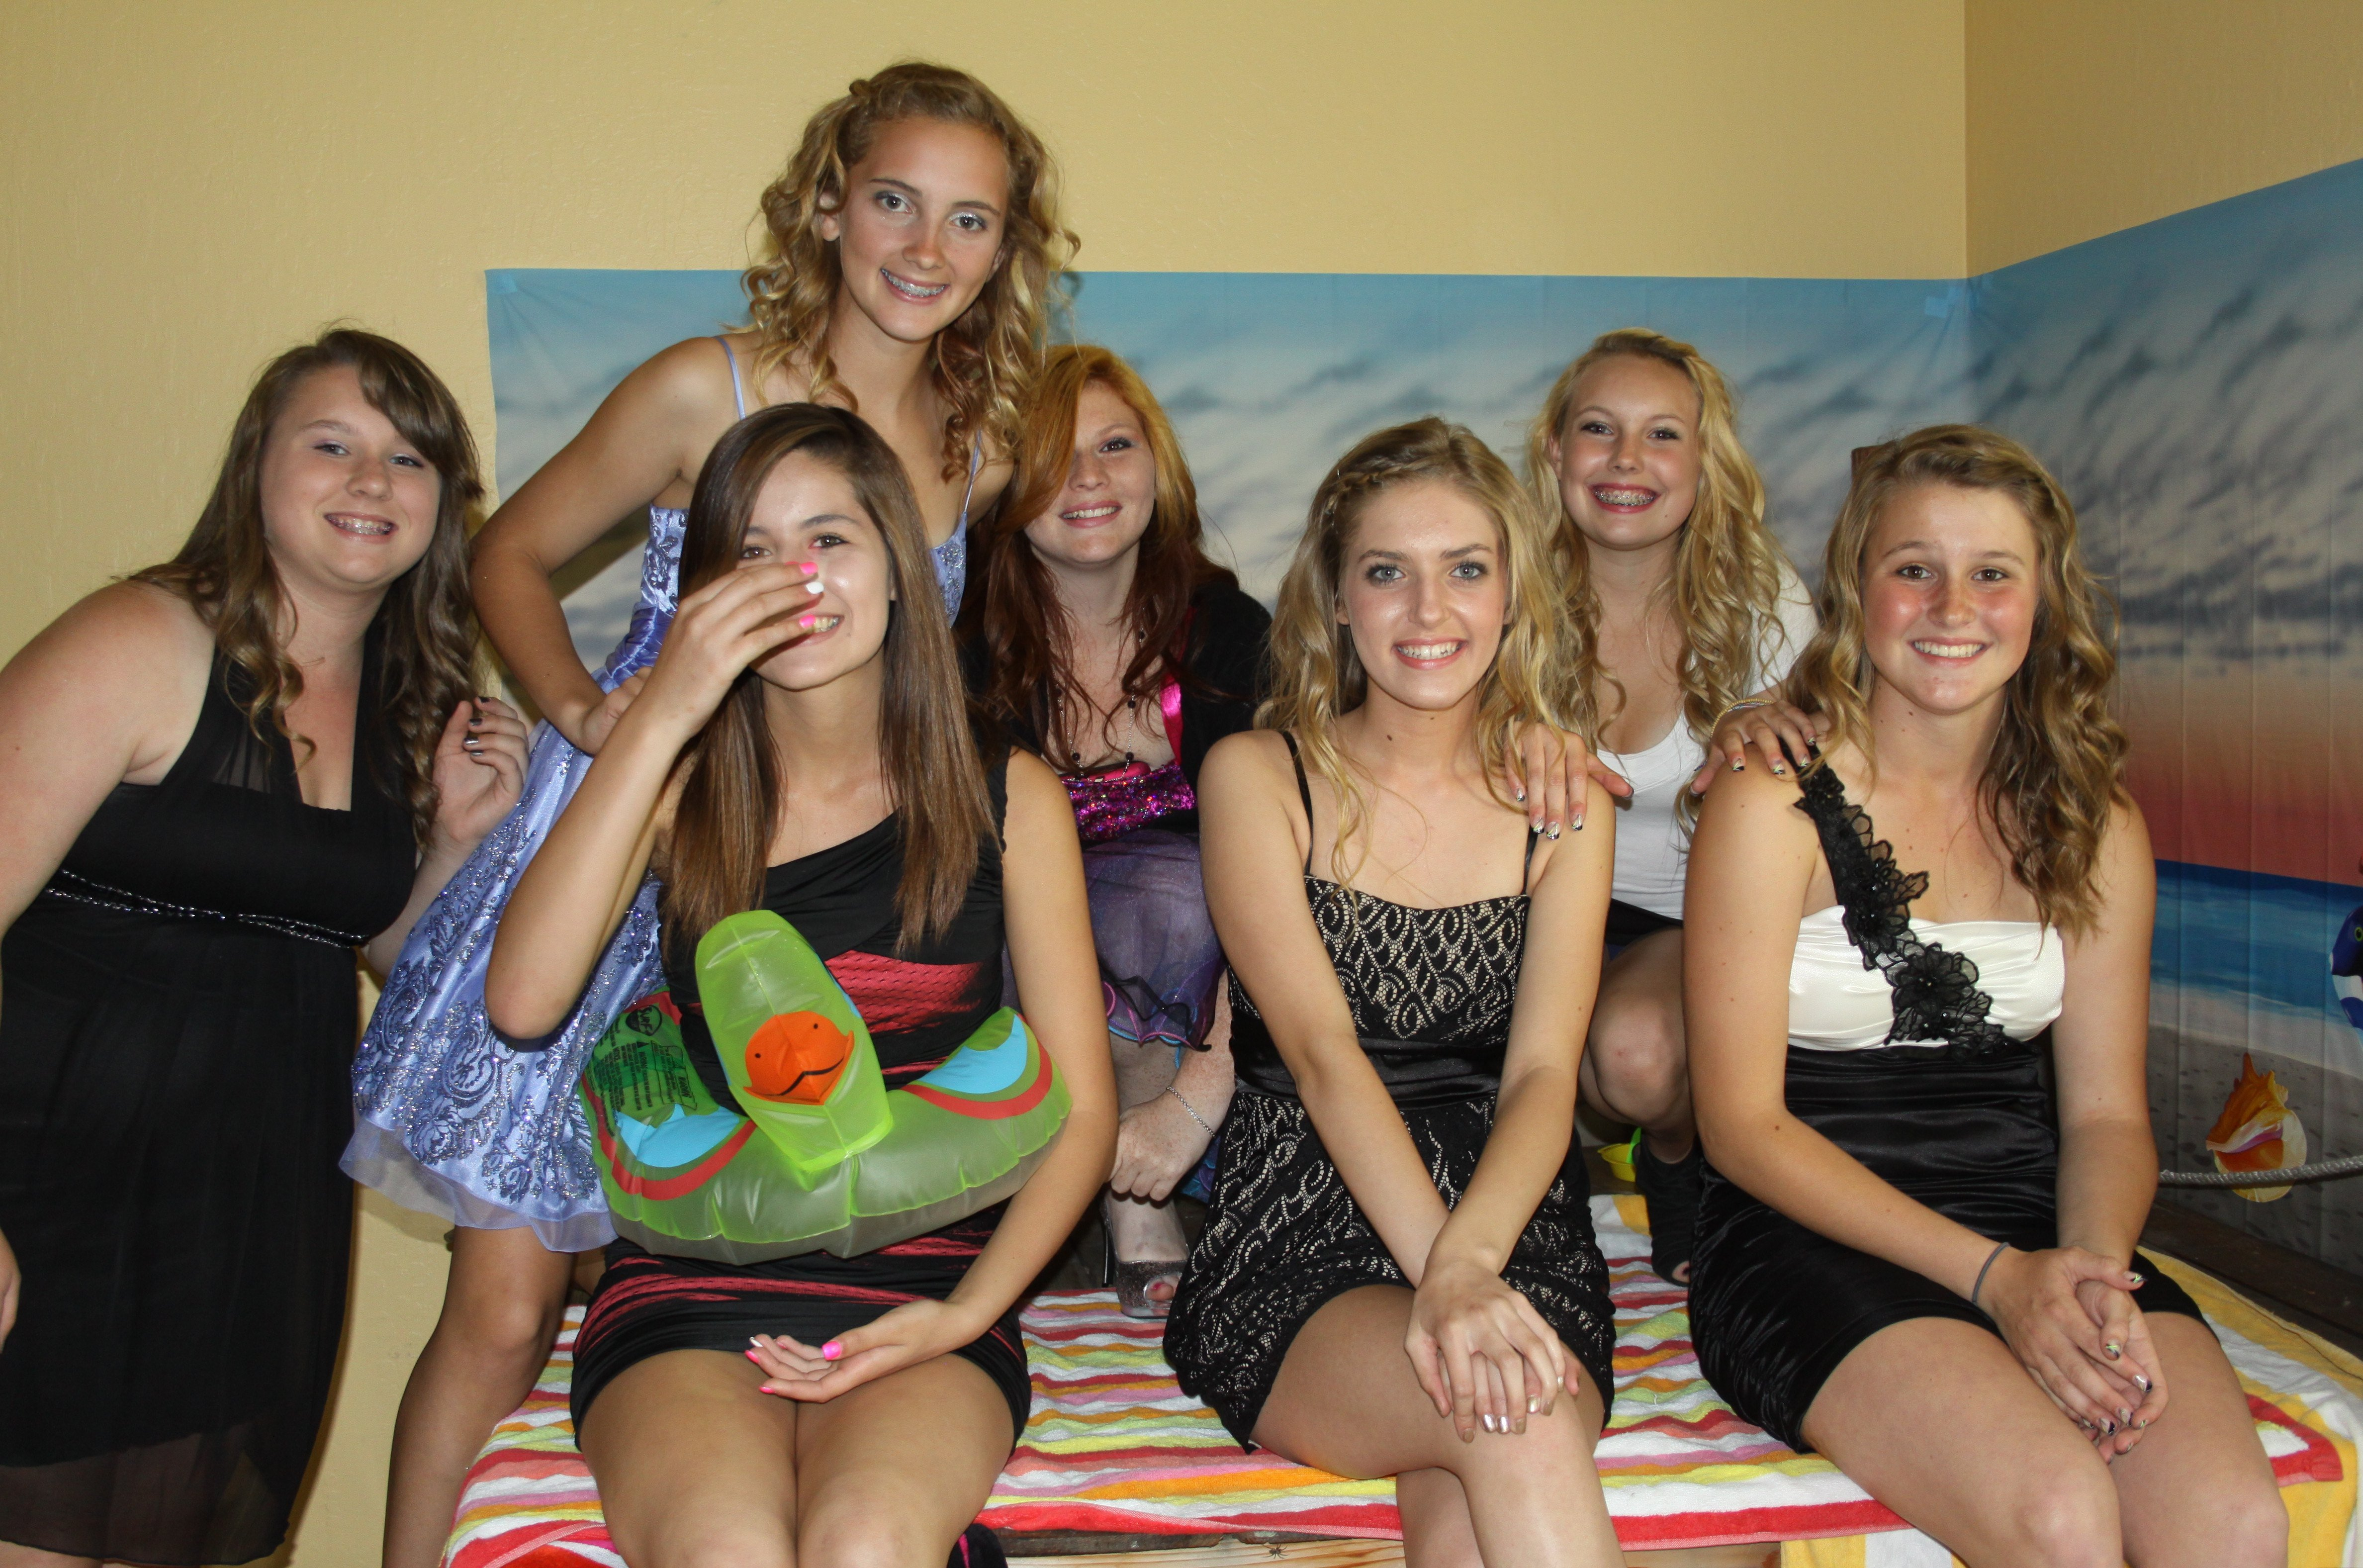 Девушки в мини-платьях светят трусиками на вечеринке